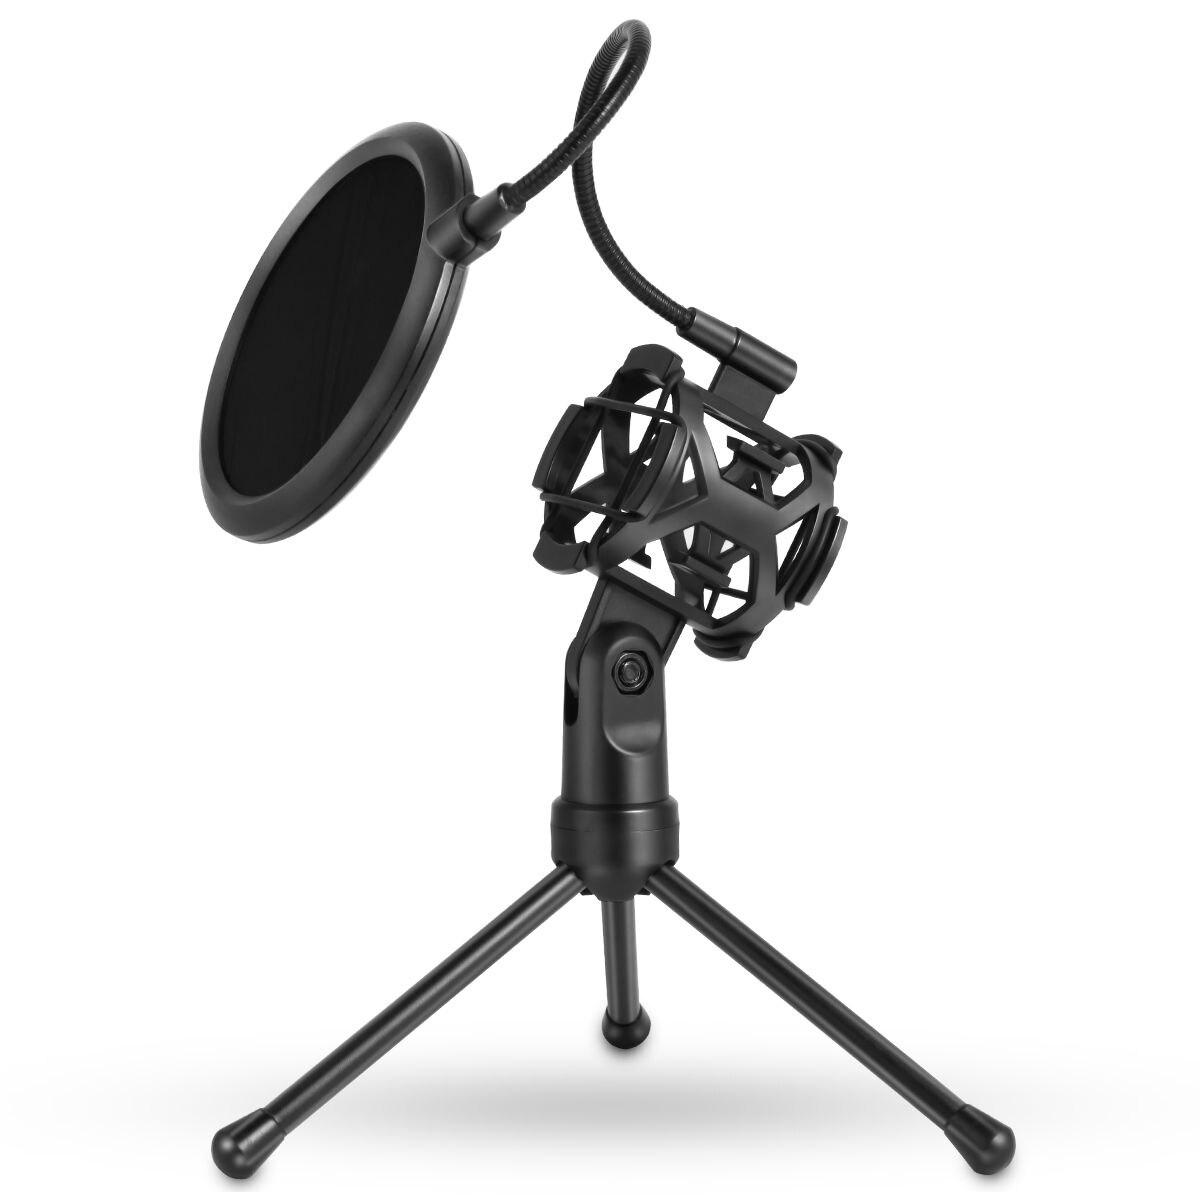 Tragbare Mikrofon Desktop-stativ Aufnahme Mikrofon Stehen Mit Mikrofon Clip Windschutz Filter Unterhaltungselektronik